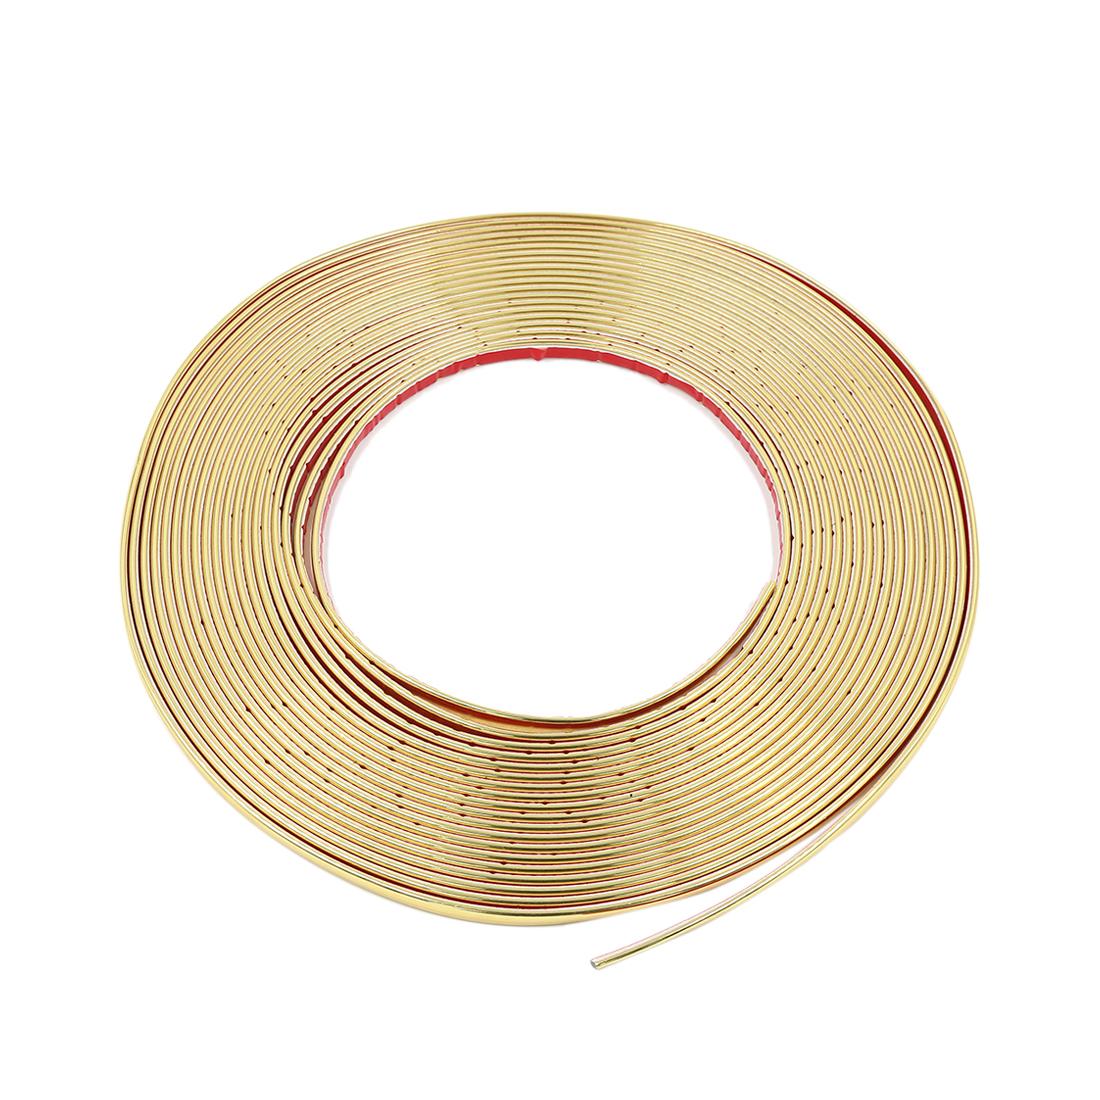 15M Gold Tone Flexible DIY Car Door Edge Guard Moulding Trim Protector Strip